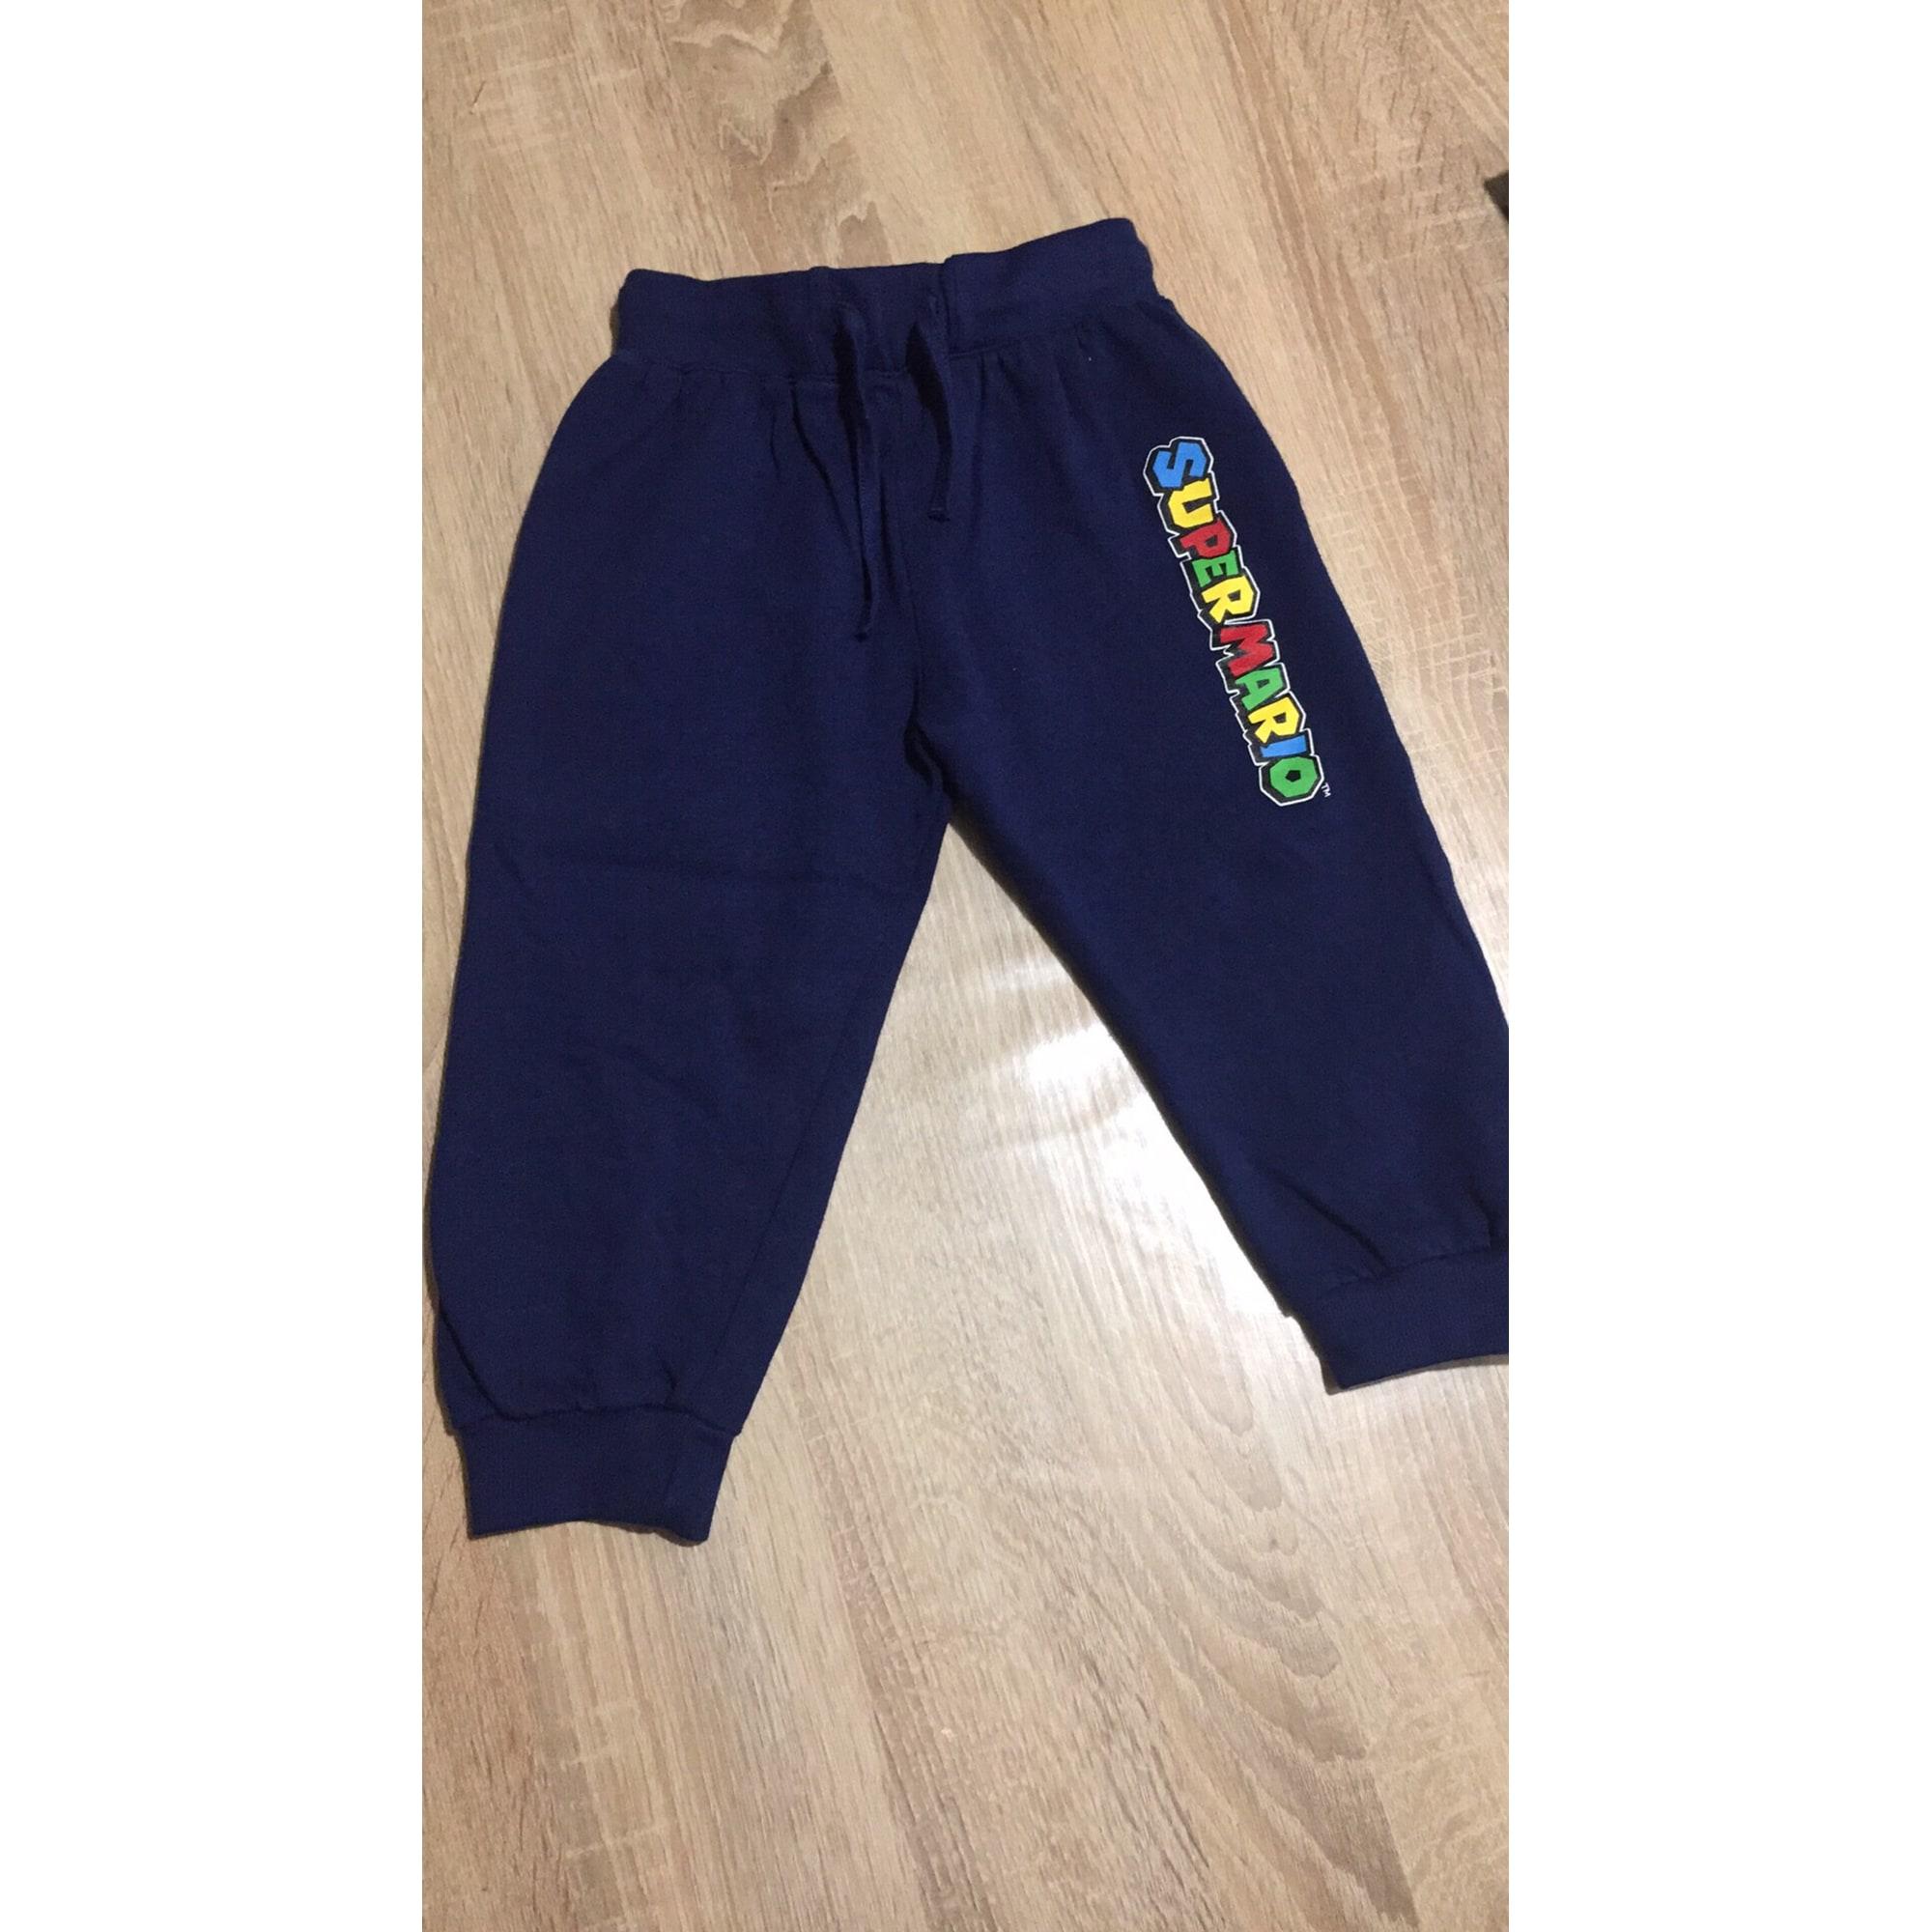 Pantalon de survêtement MARIO Bleu, bleu marine, bleu turquoise